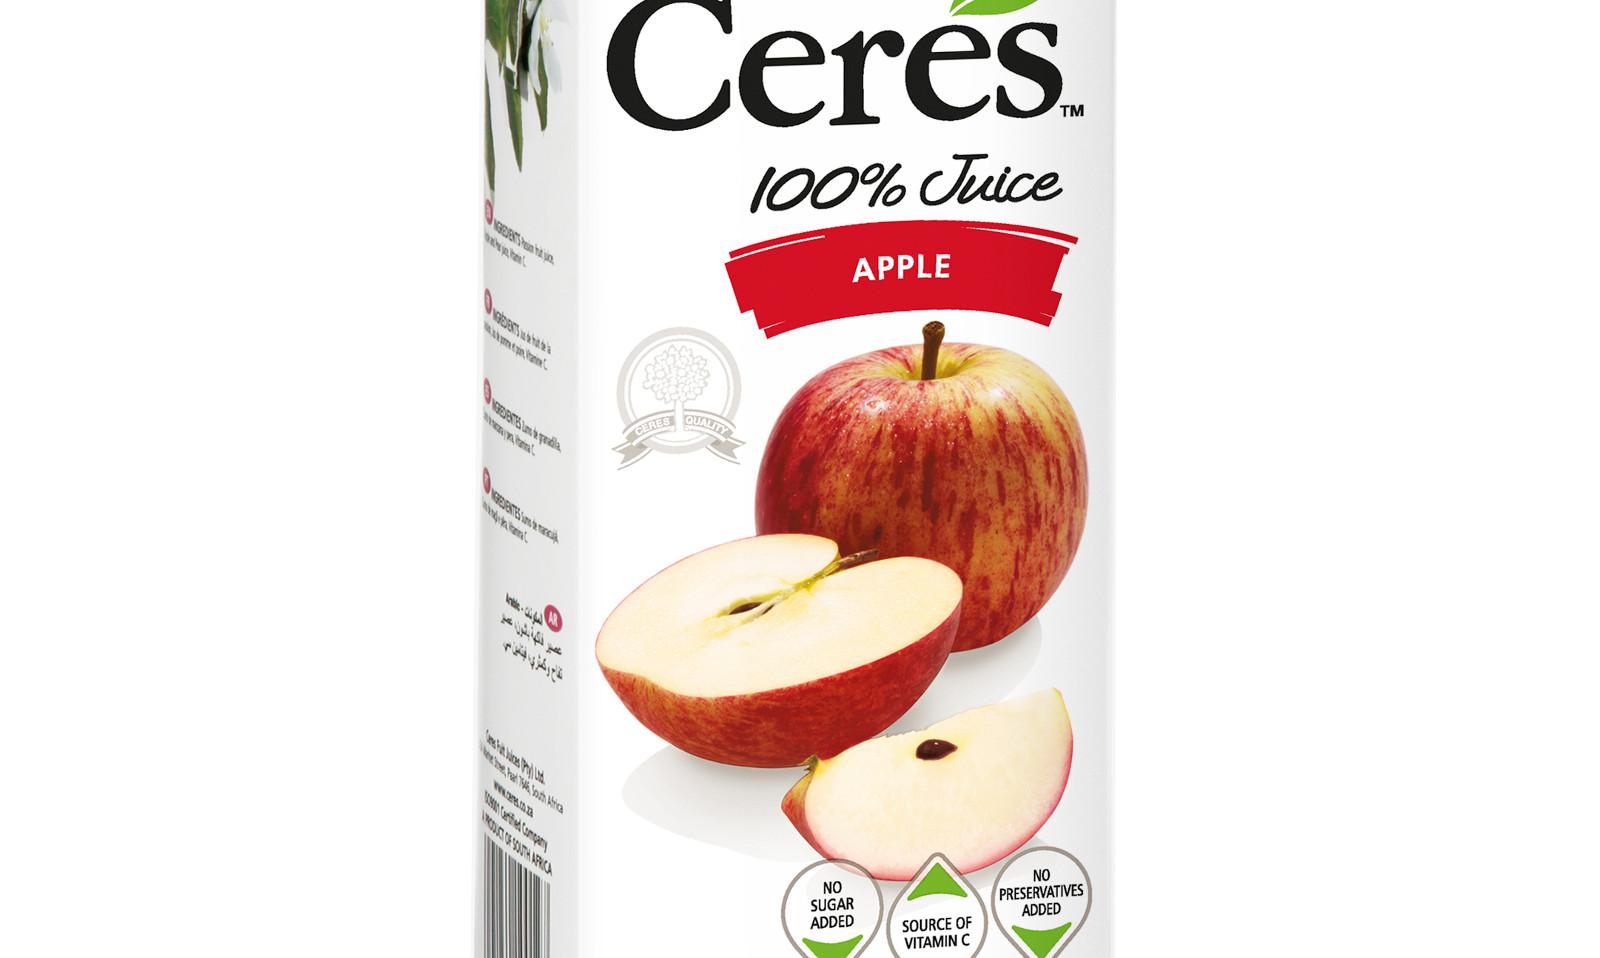 Ceres-100_-Juice-Apple-1L.jpg